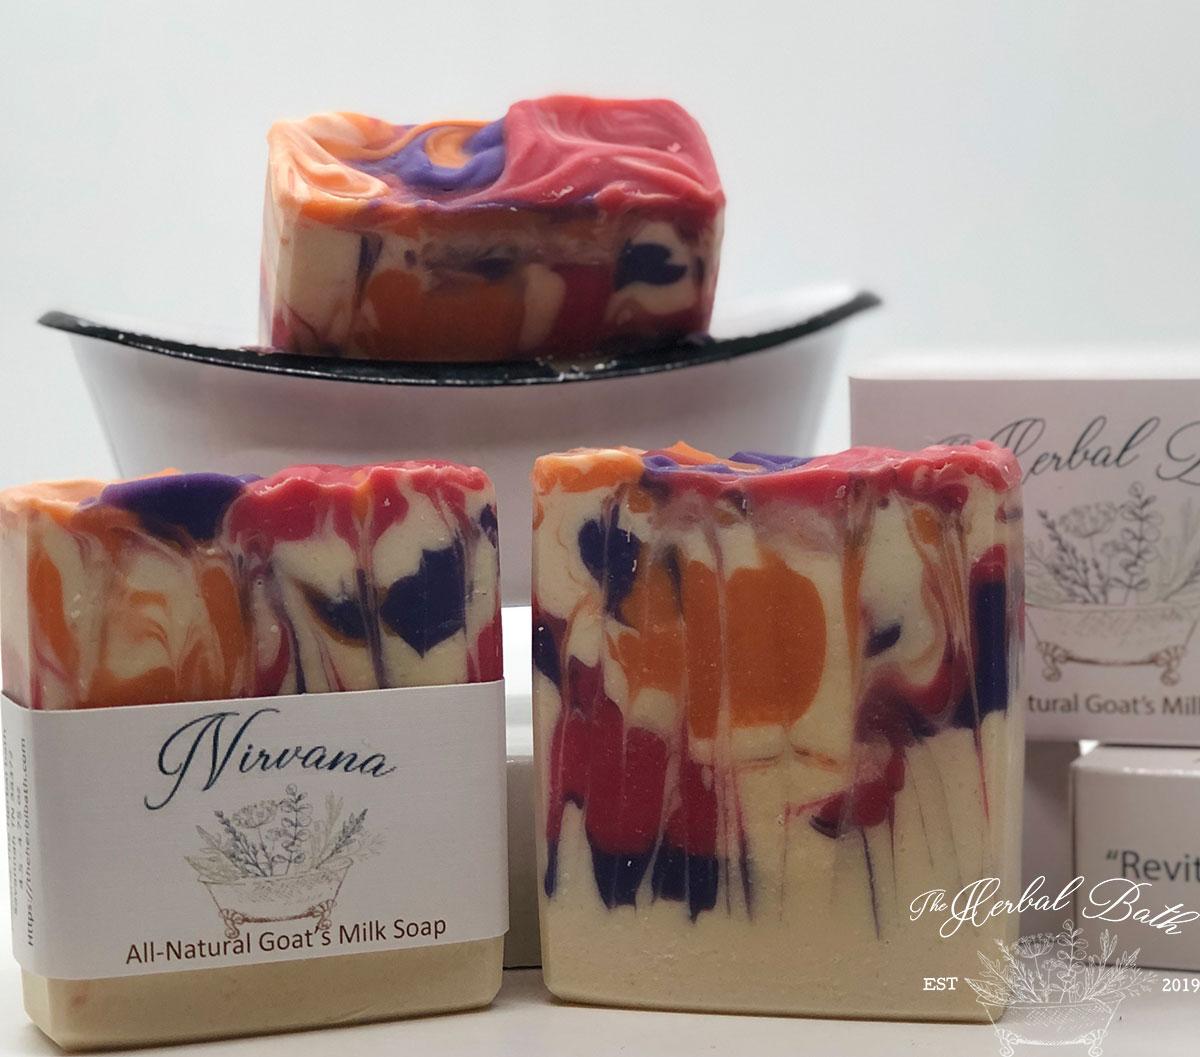 Nirvana Goat's milk soap